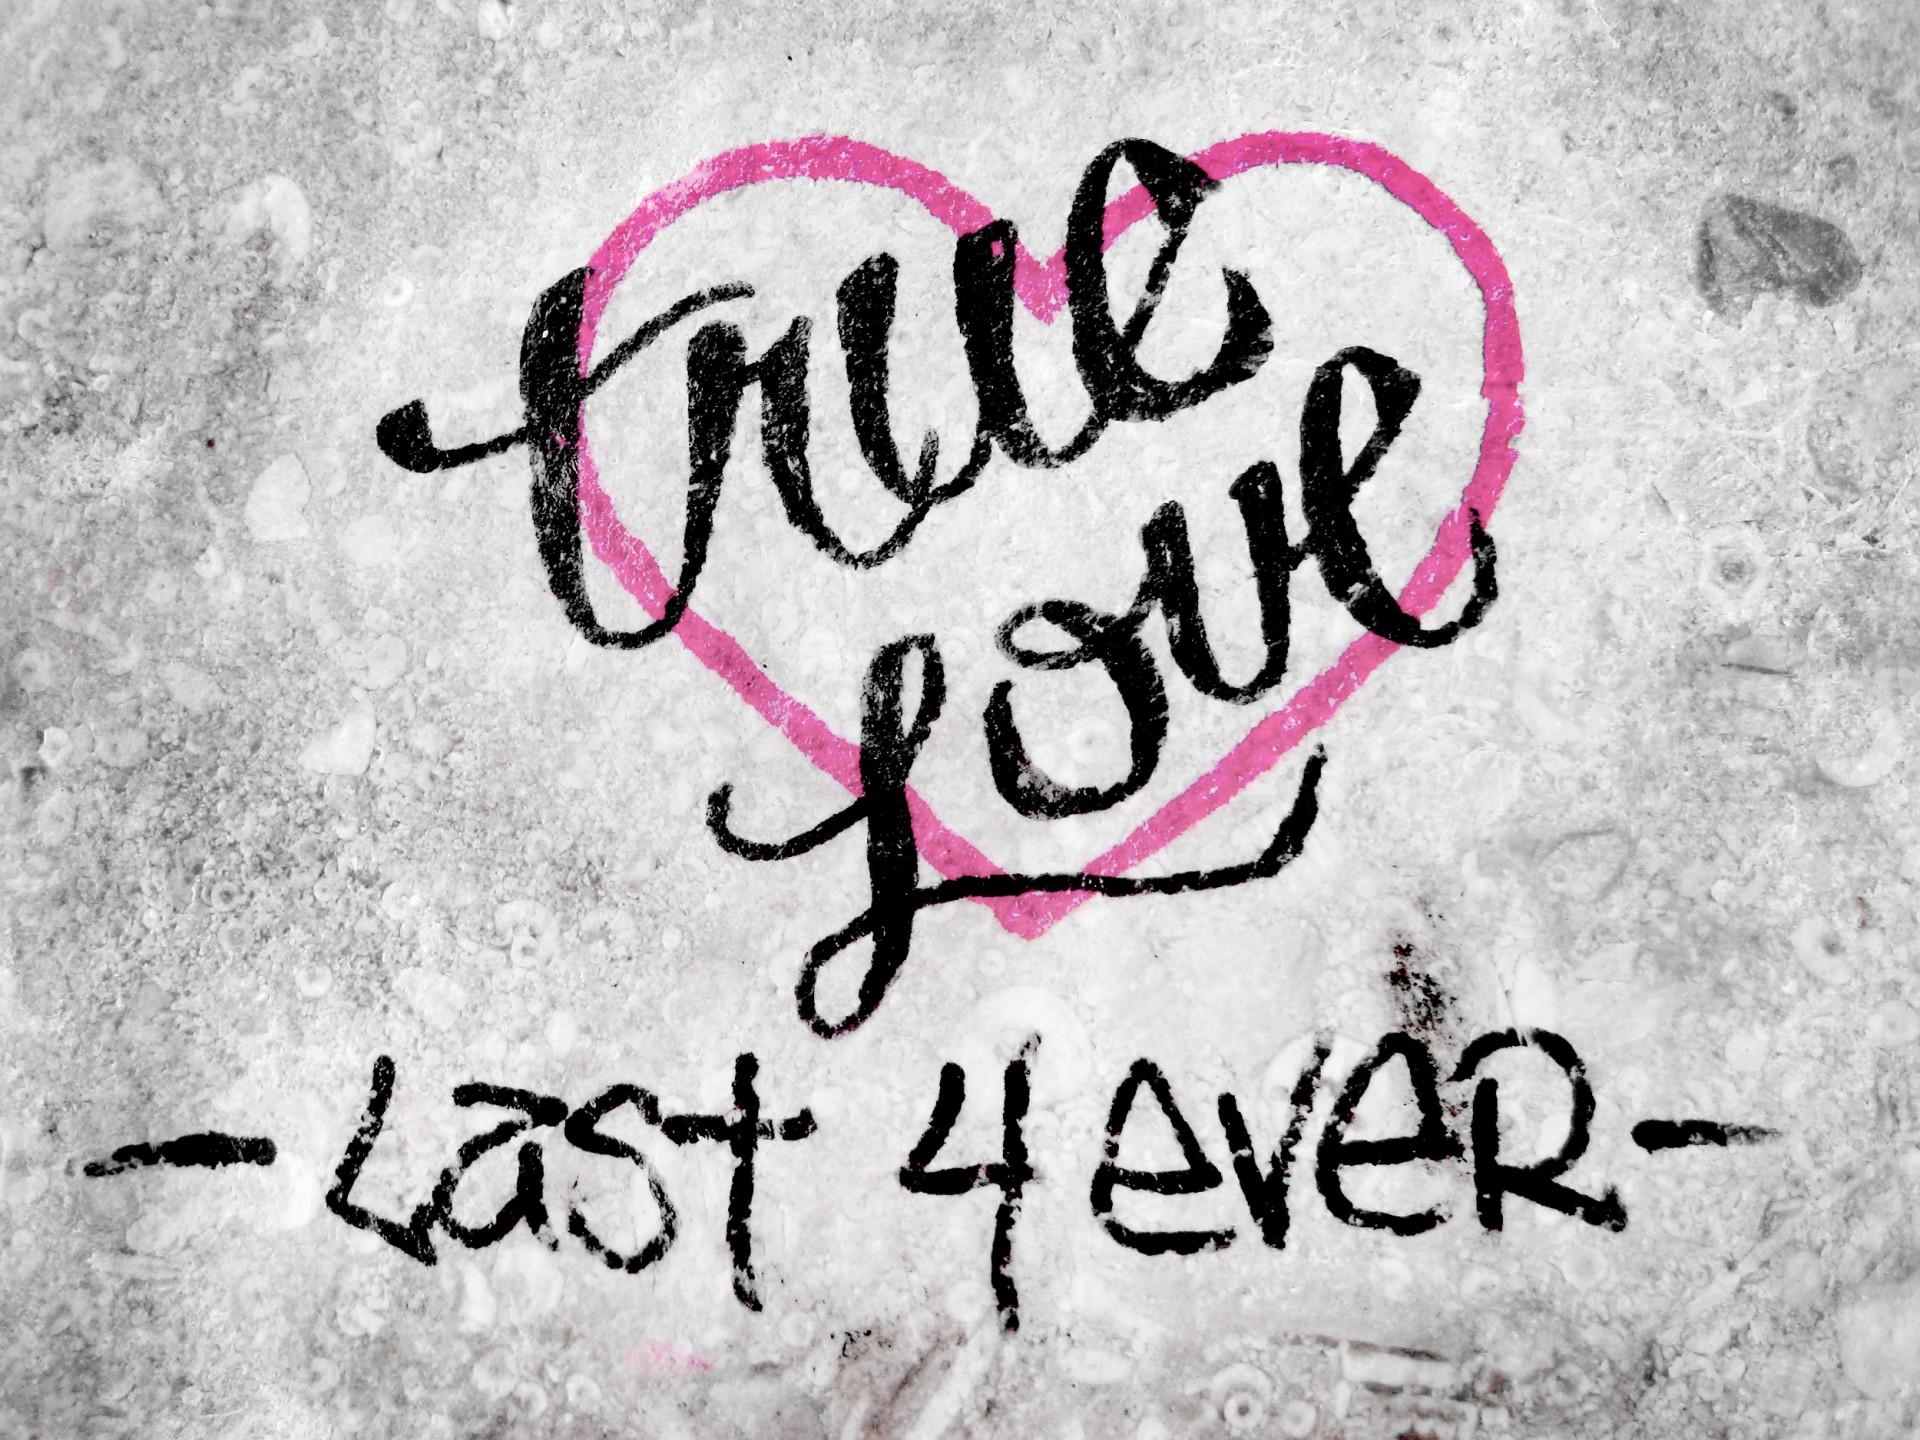 True Love Graffiti Style Free Stock Photo Public Domain